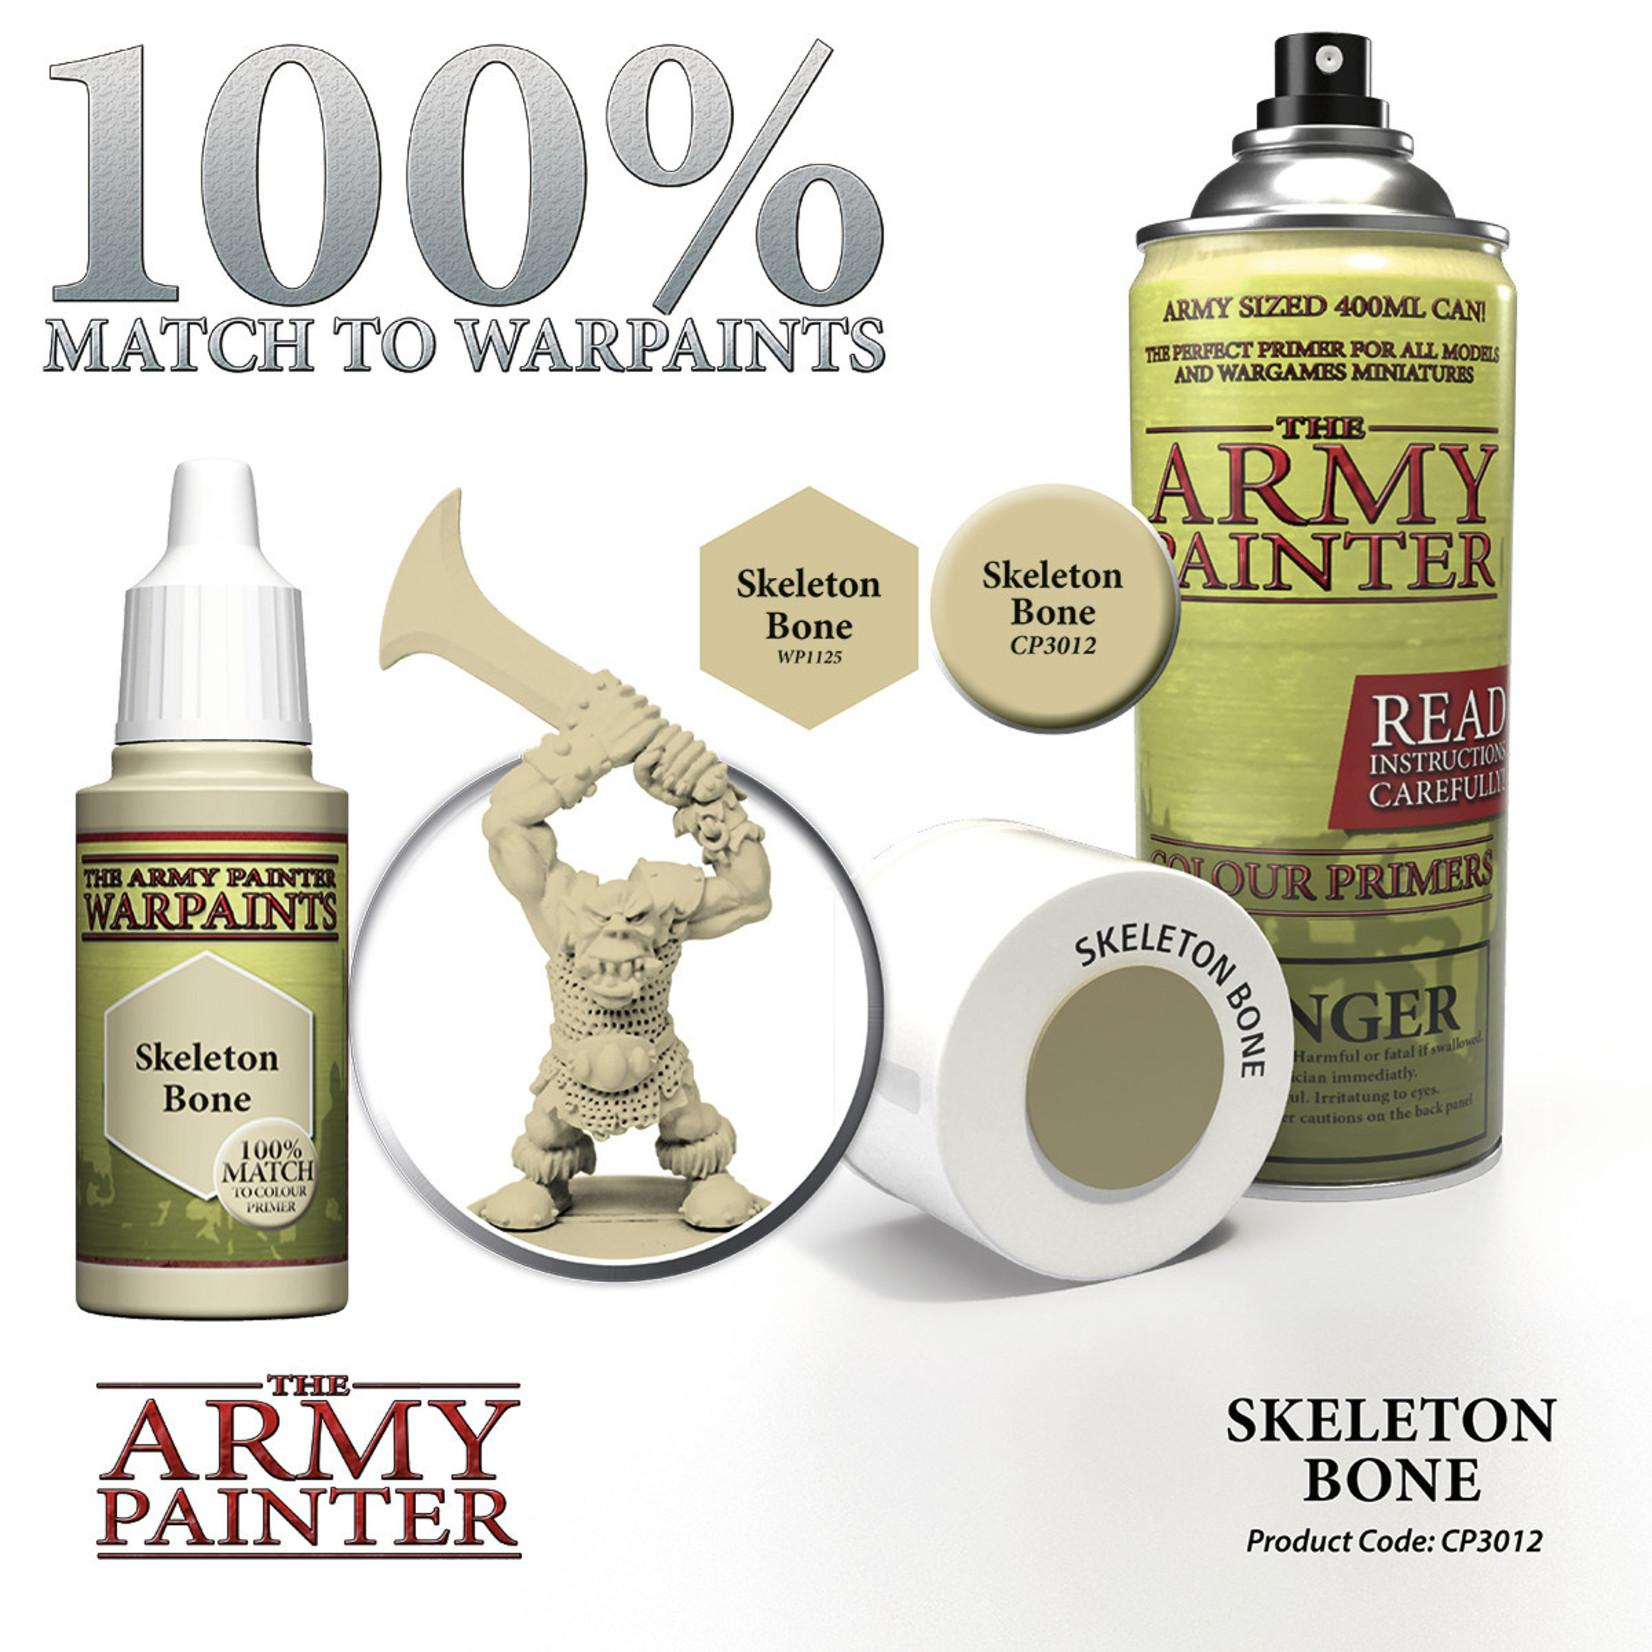 The Army Painter Color Primer Skeleton Bone